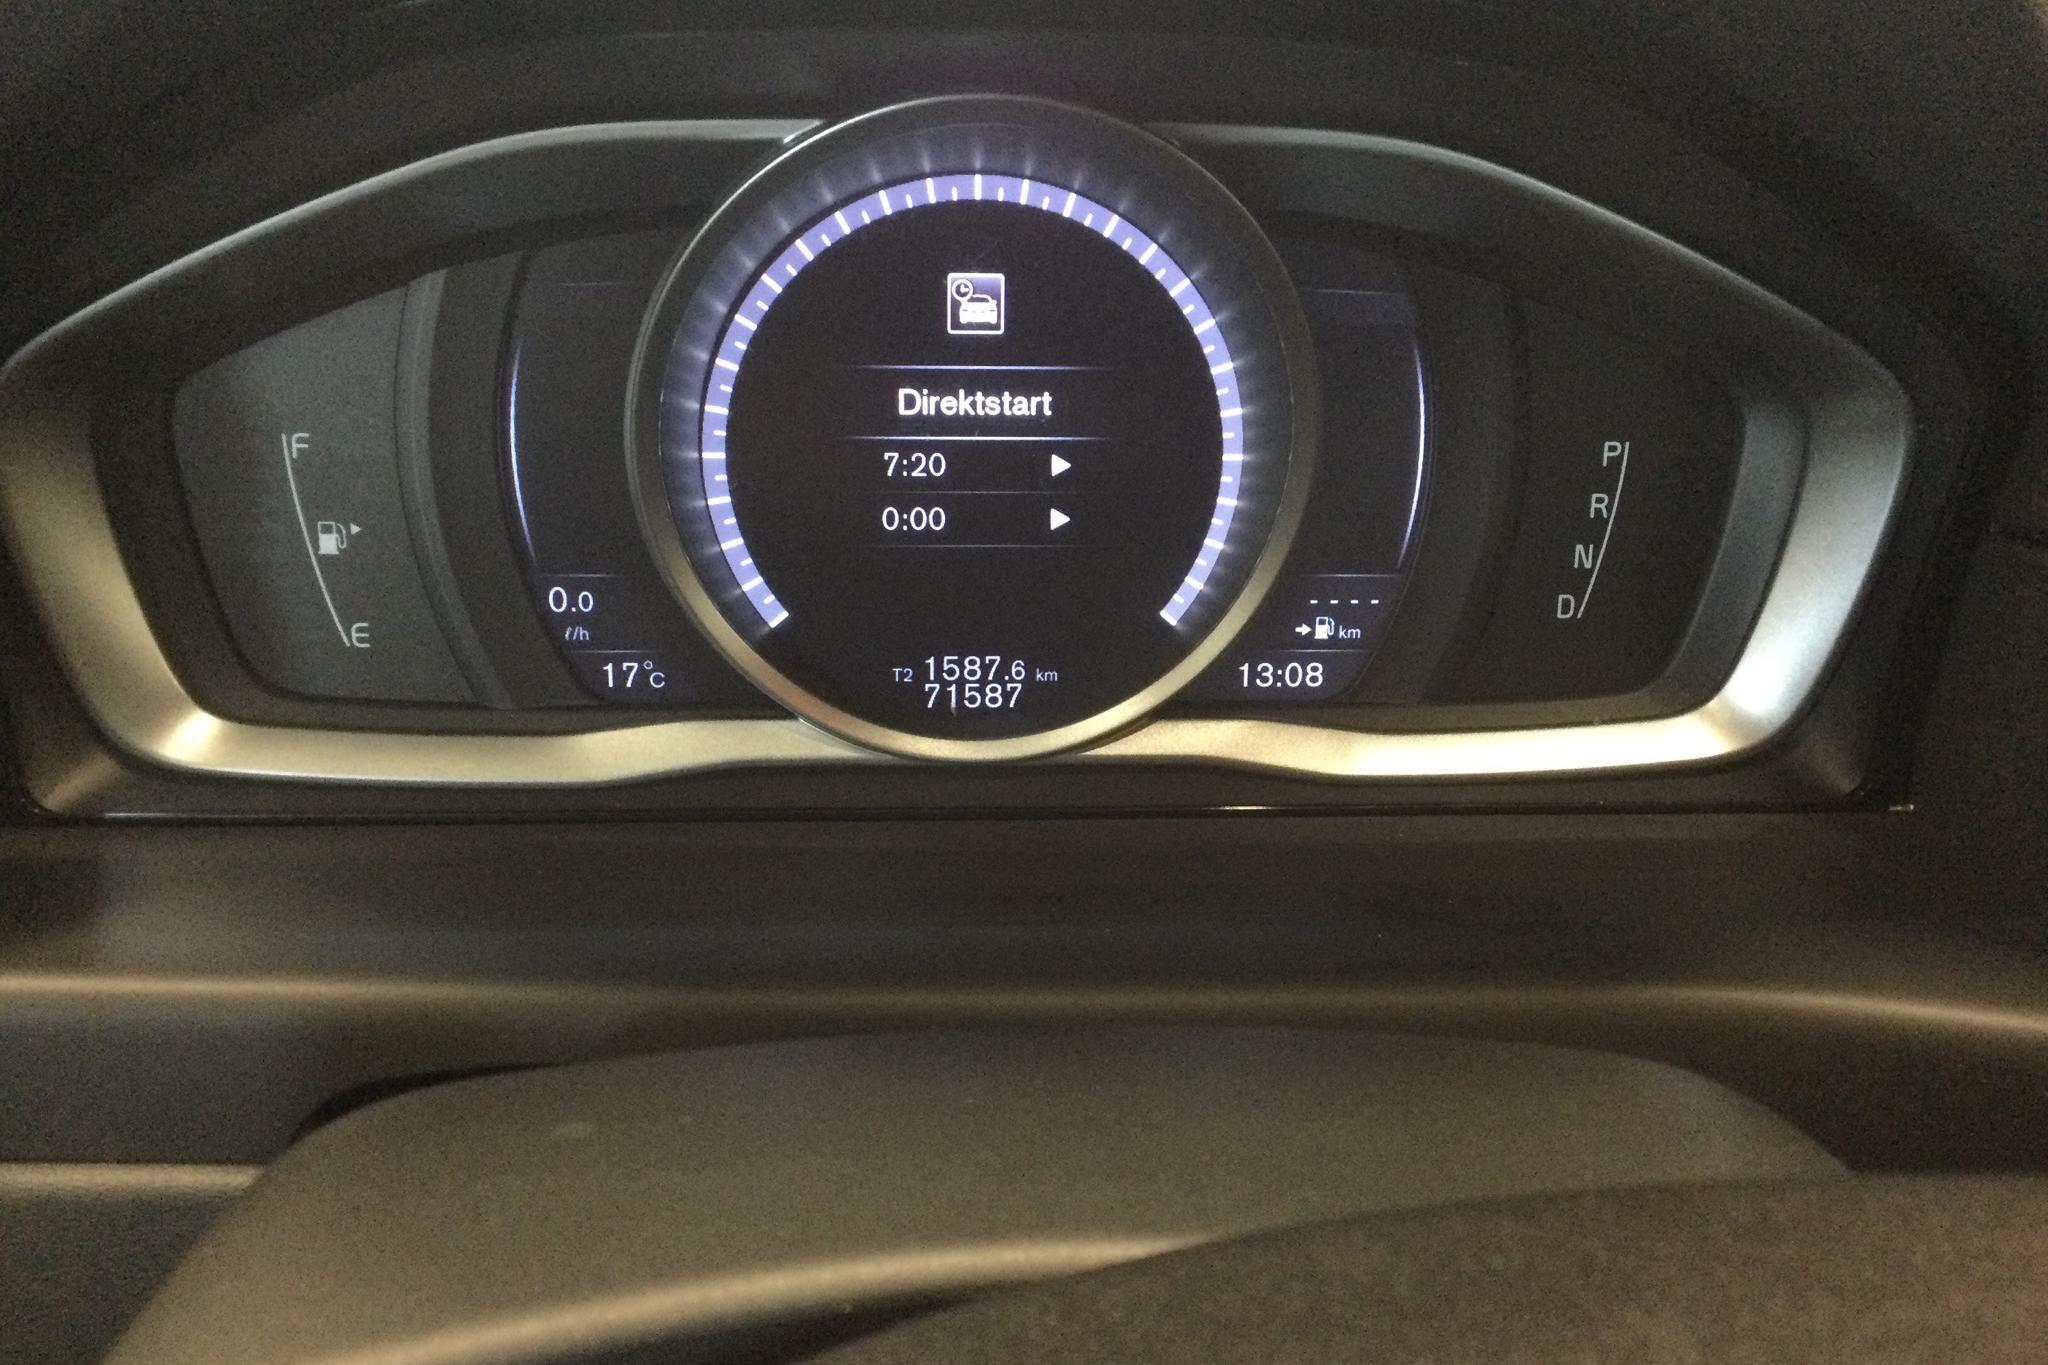 Volvo XC70 II D4 AWD (181hk) - 46 772 km - Automatic - white - 2016